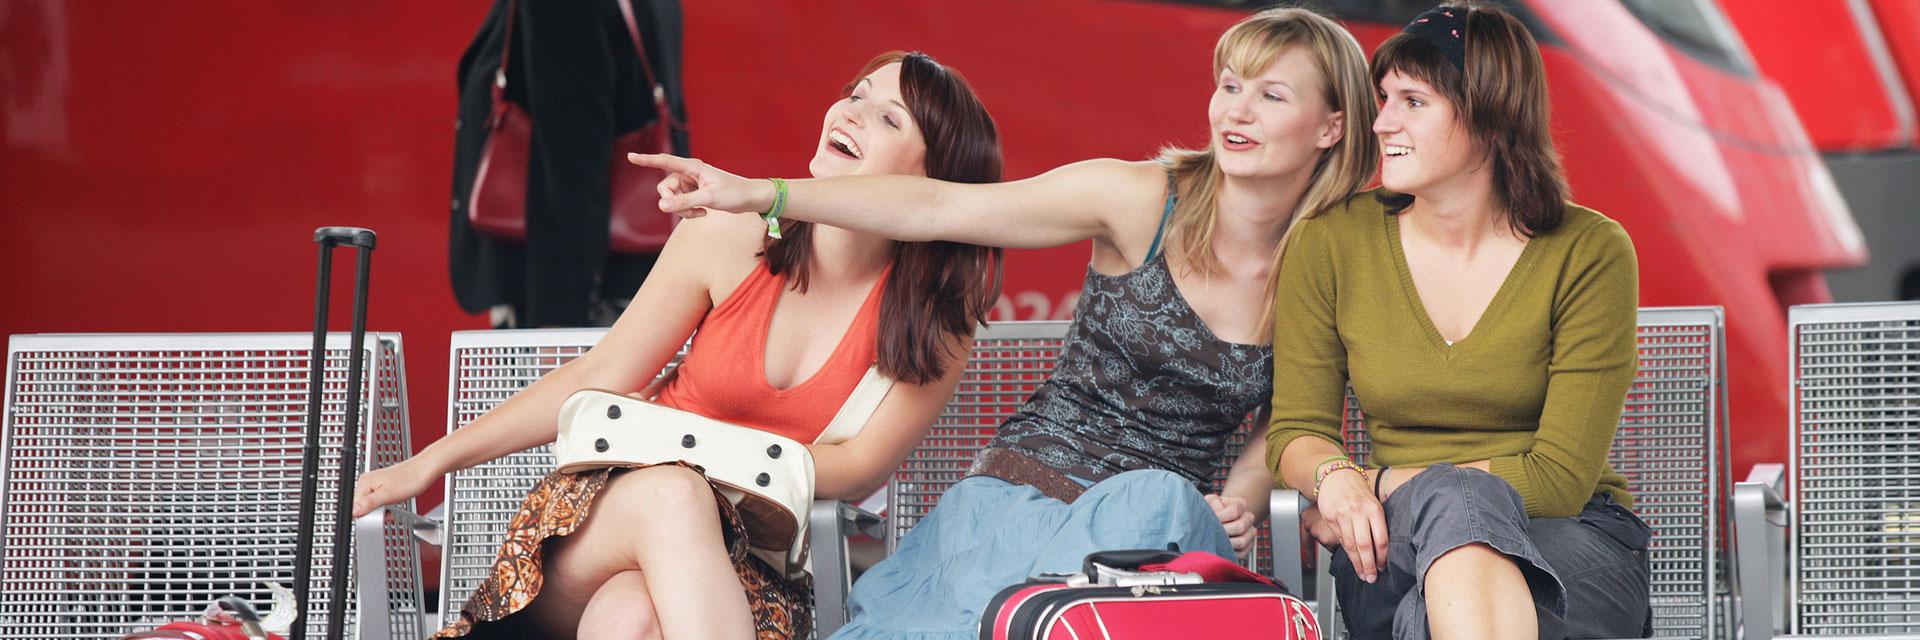 Three Women Socializing